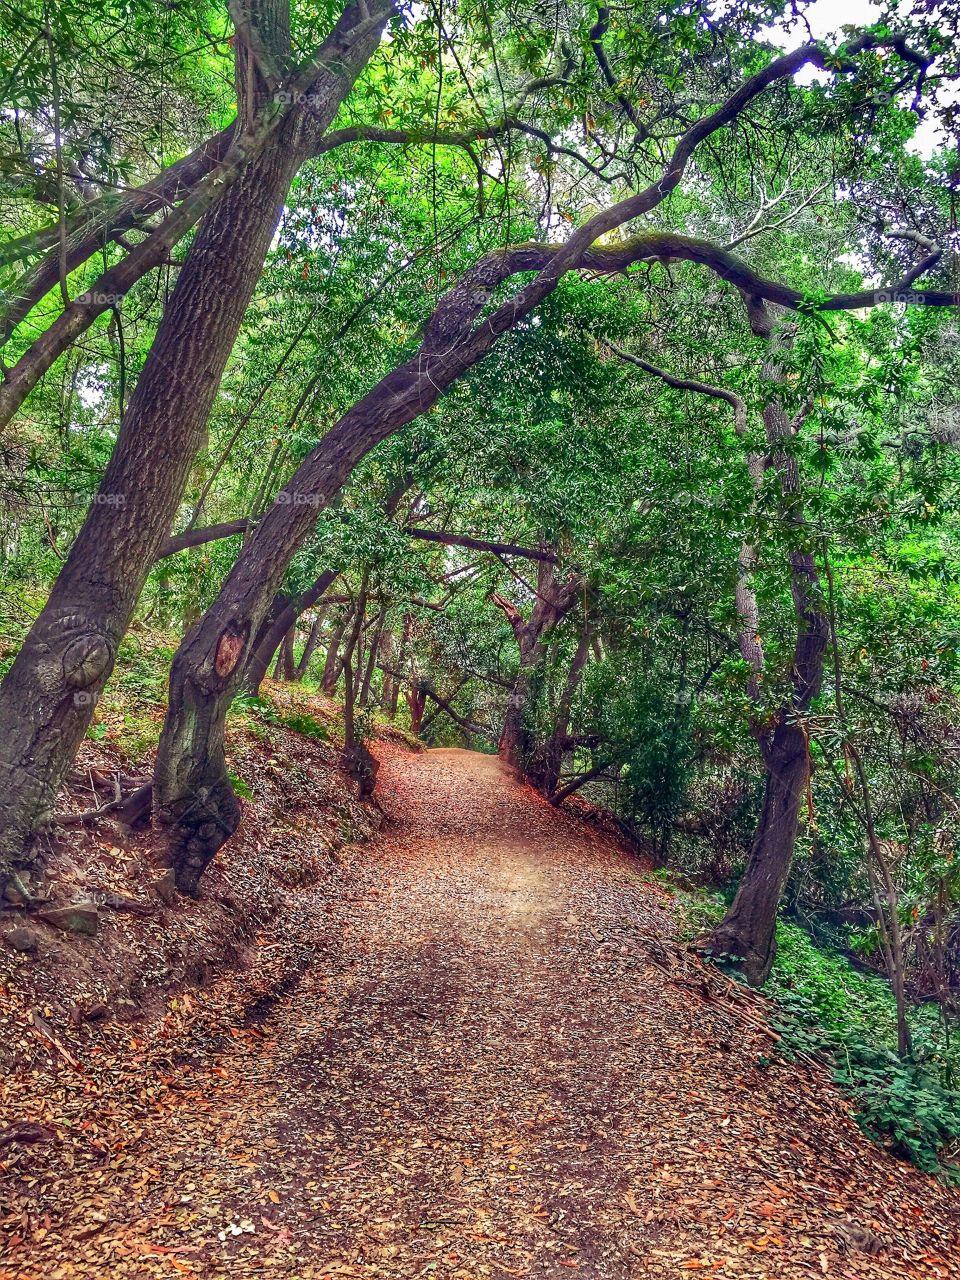 A beautiful autumn hiking trail in Northern California.